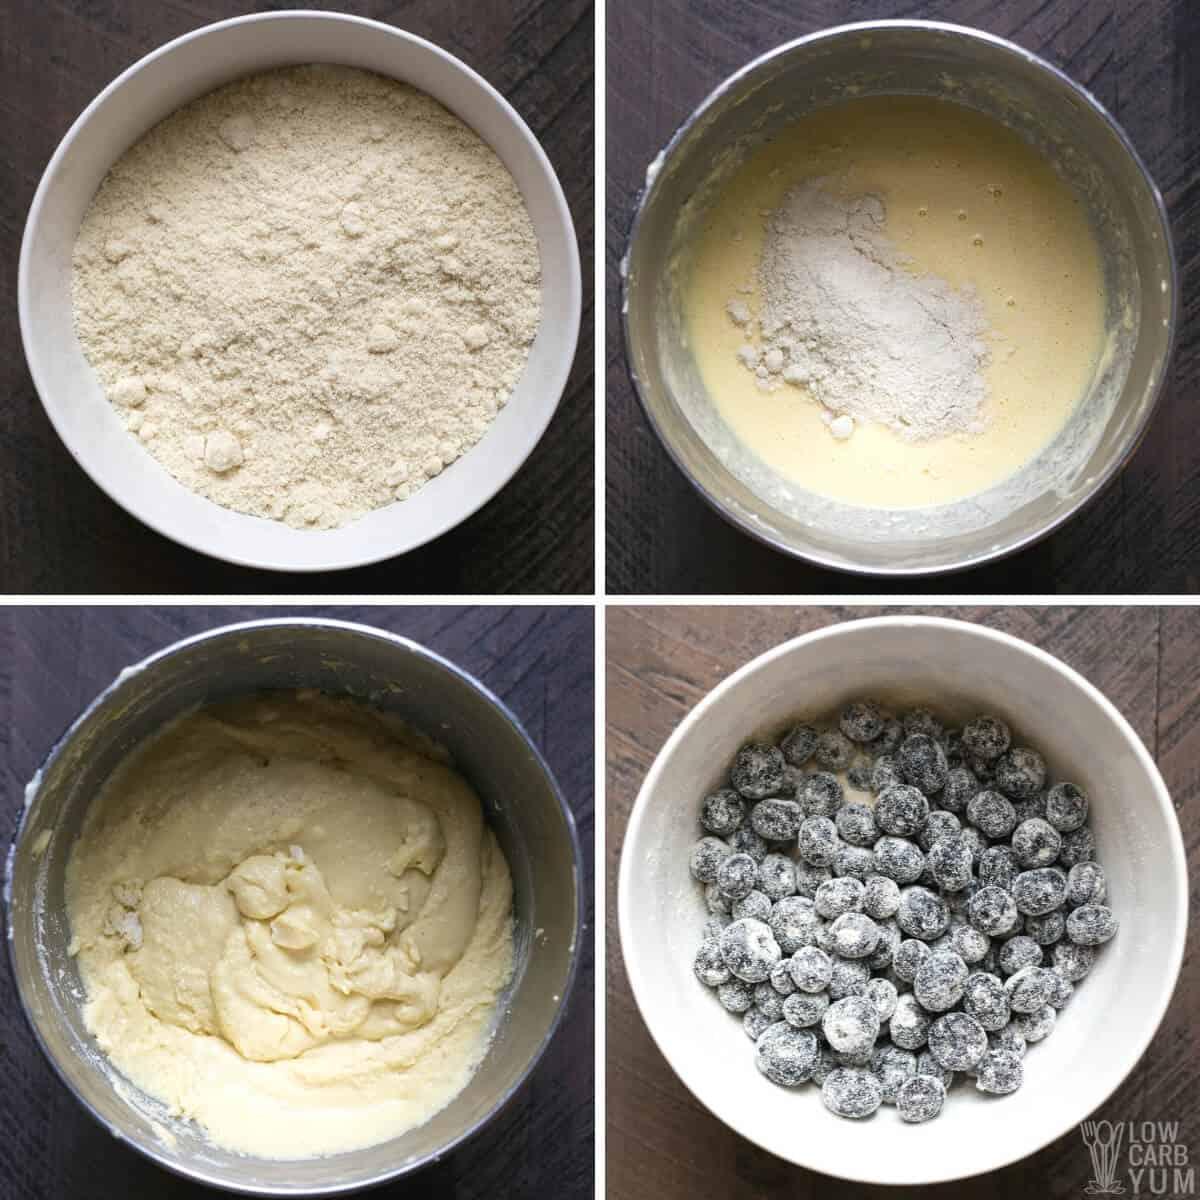 lemon blueberry pound cake recipe steps 2